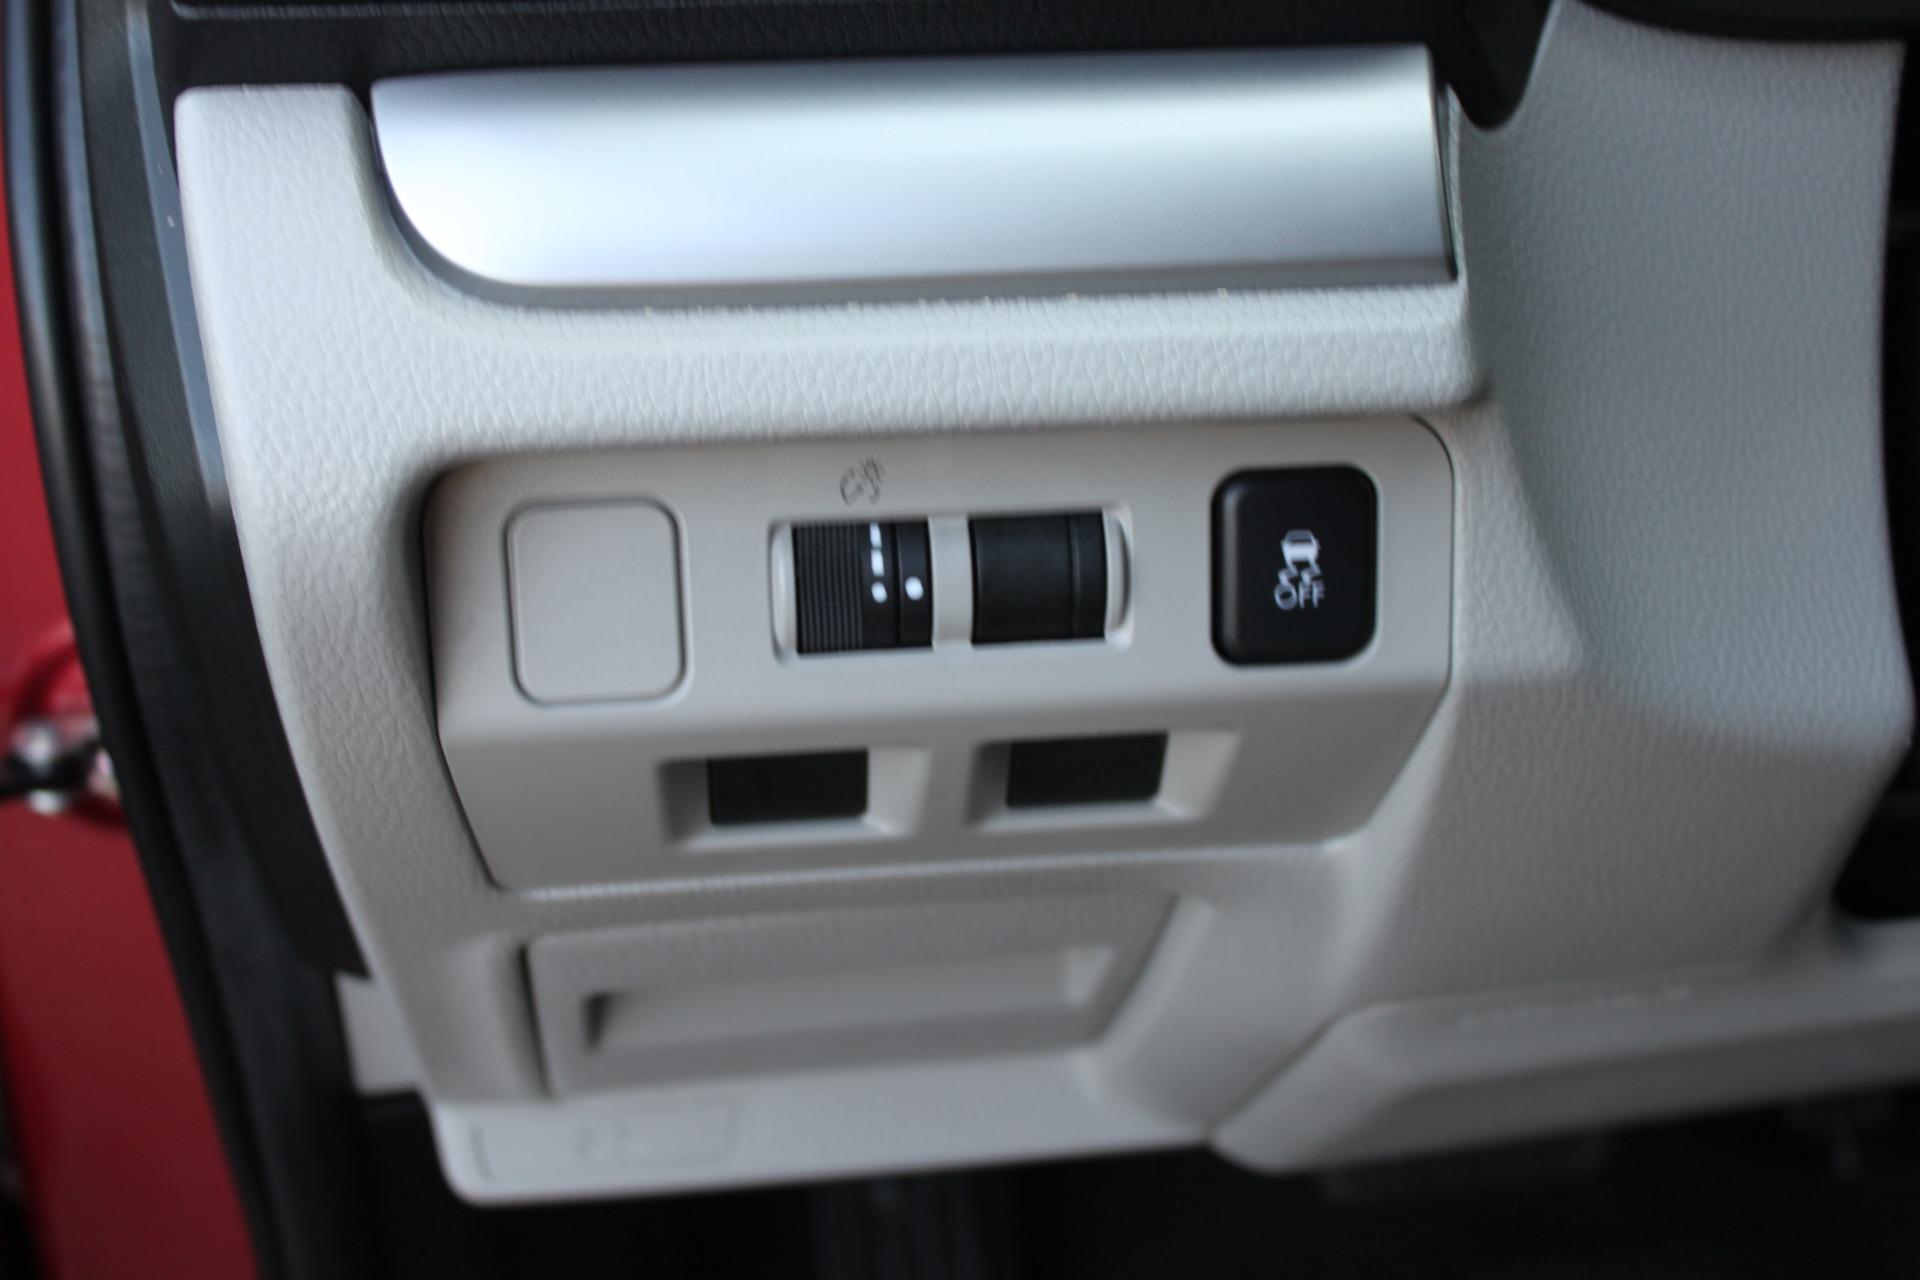 Used-2017-Subaru-Forester-25i-All-Wheel-Drive-25i-Tesla